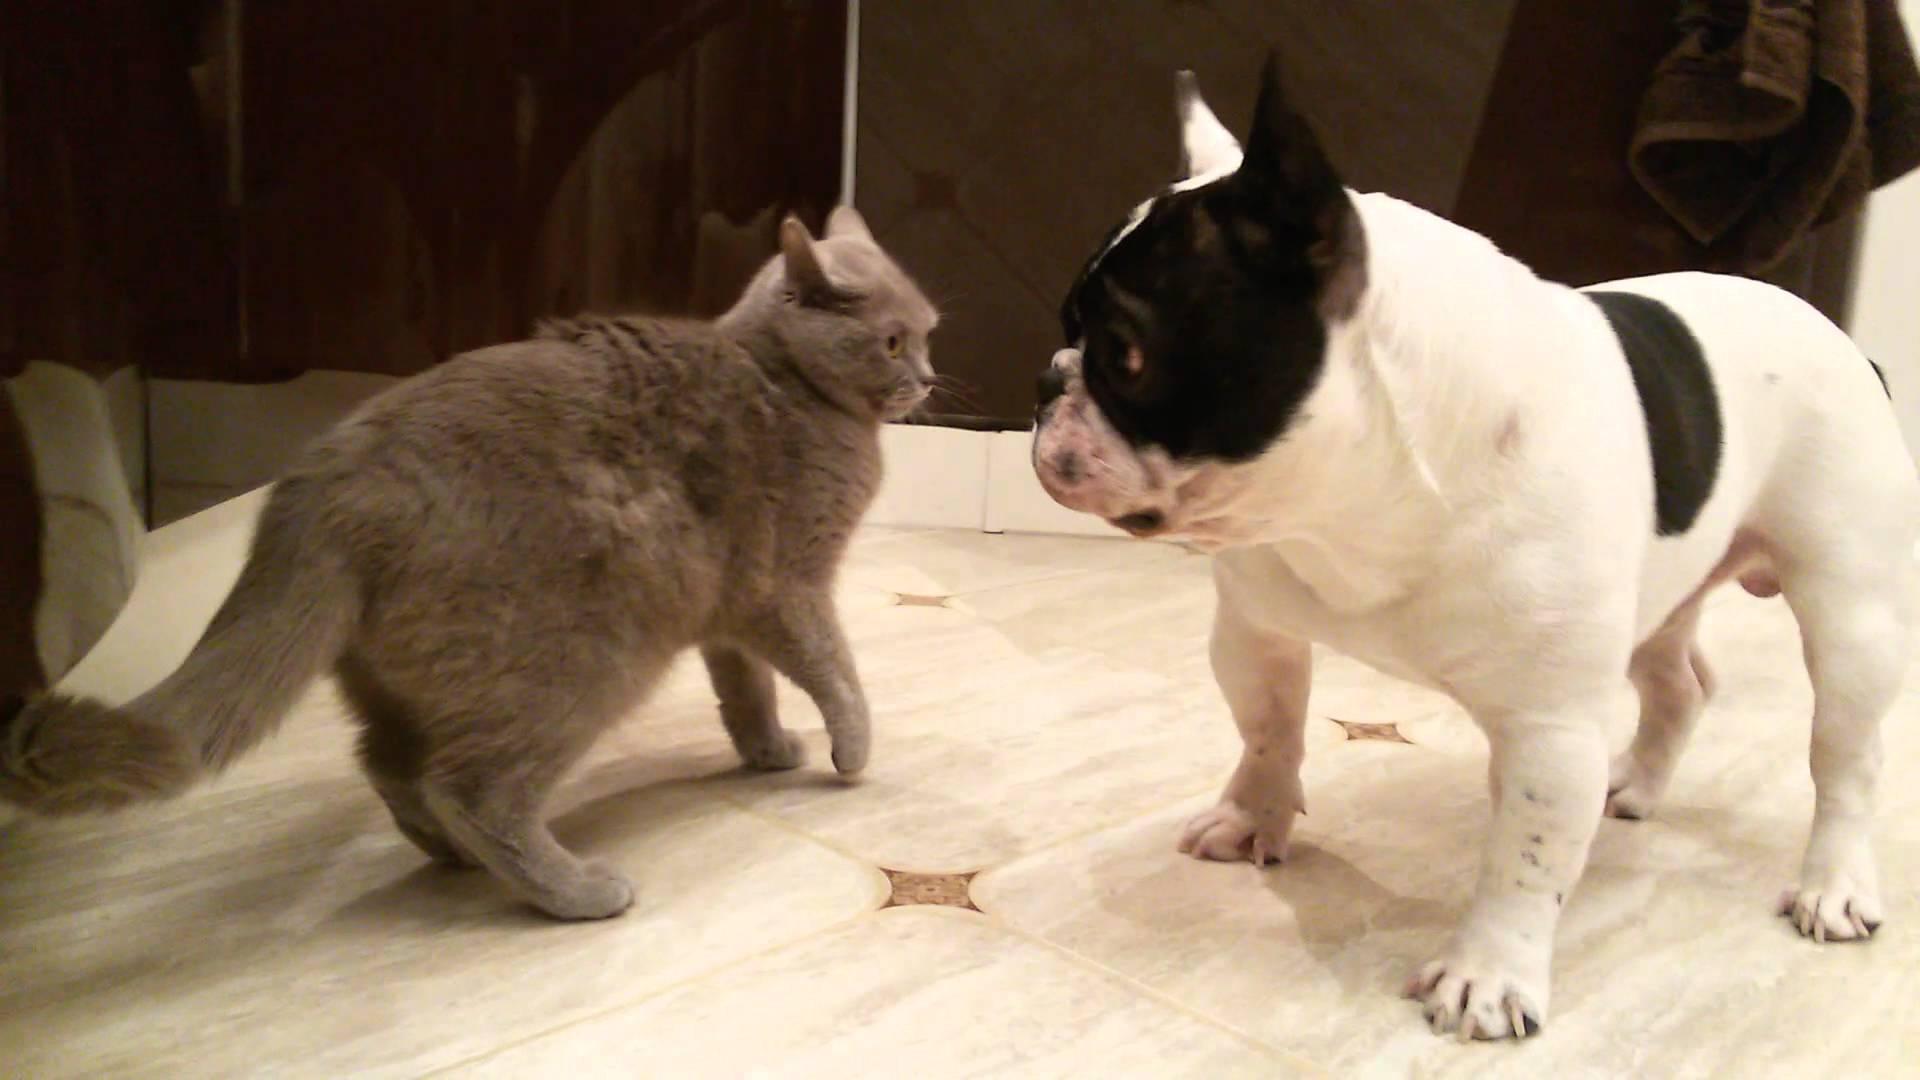 {amp}quot;Французик{amp}quot; не потерпит присутствие в дома другого животного.